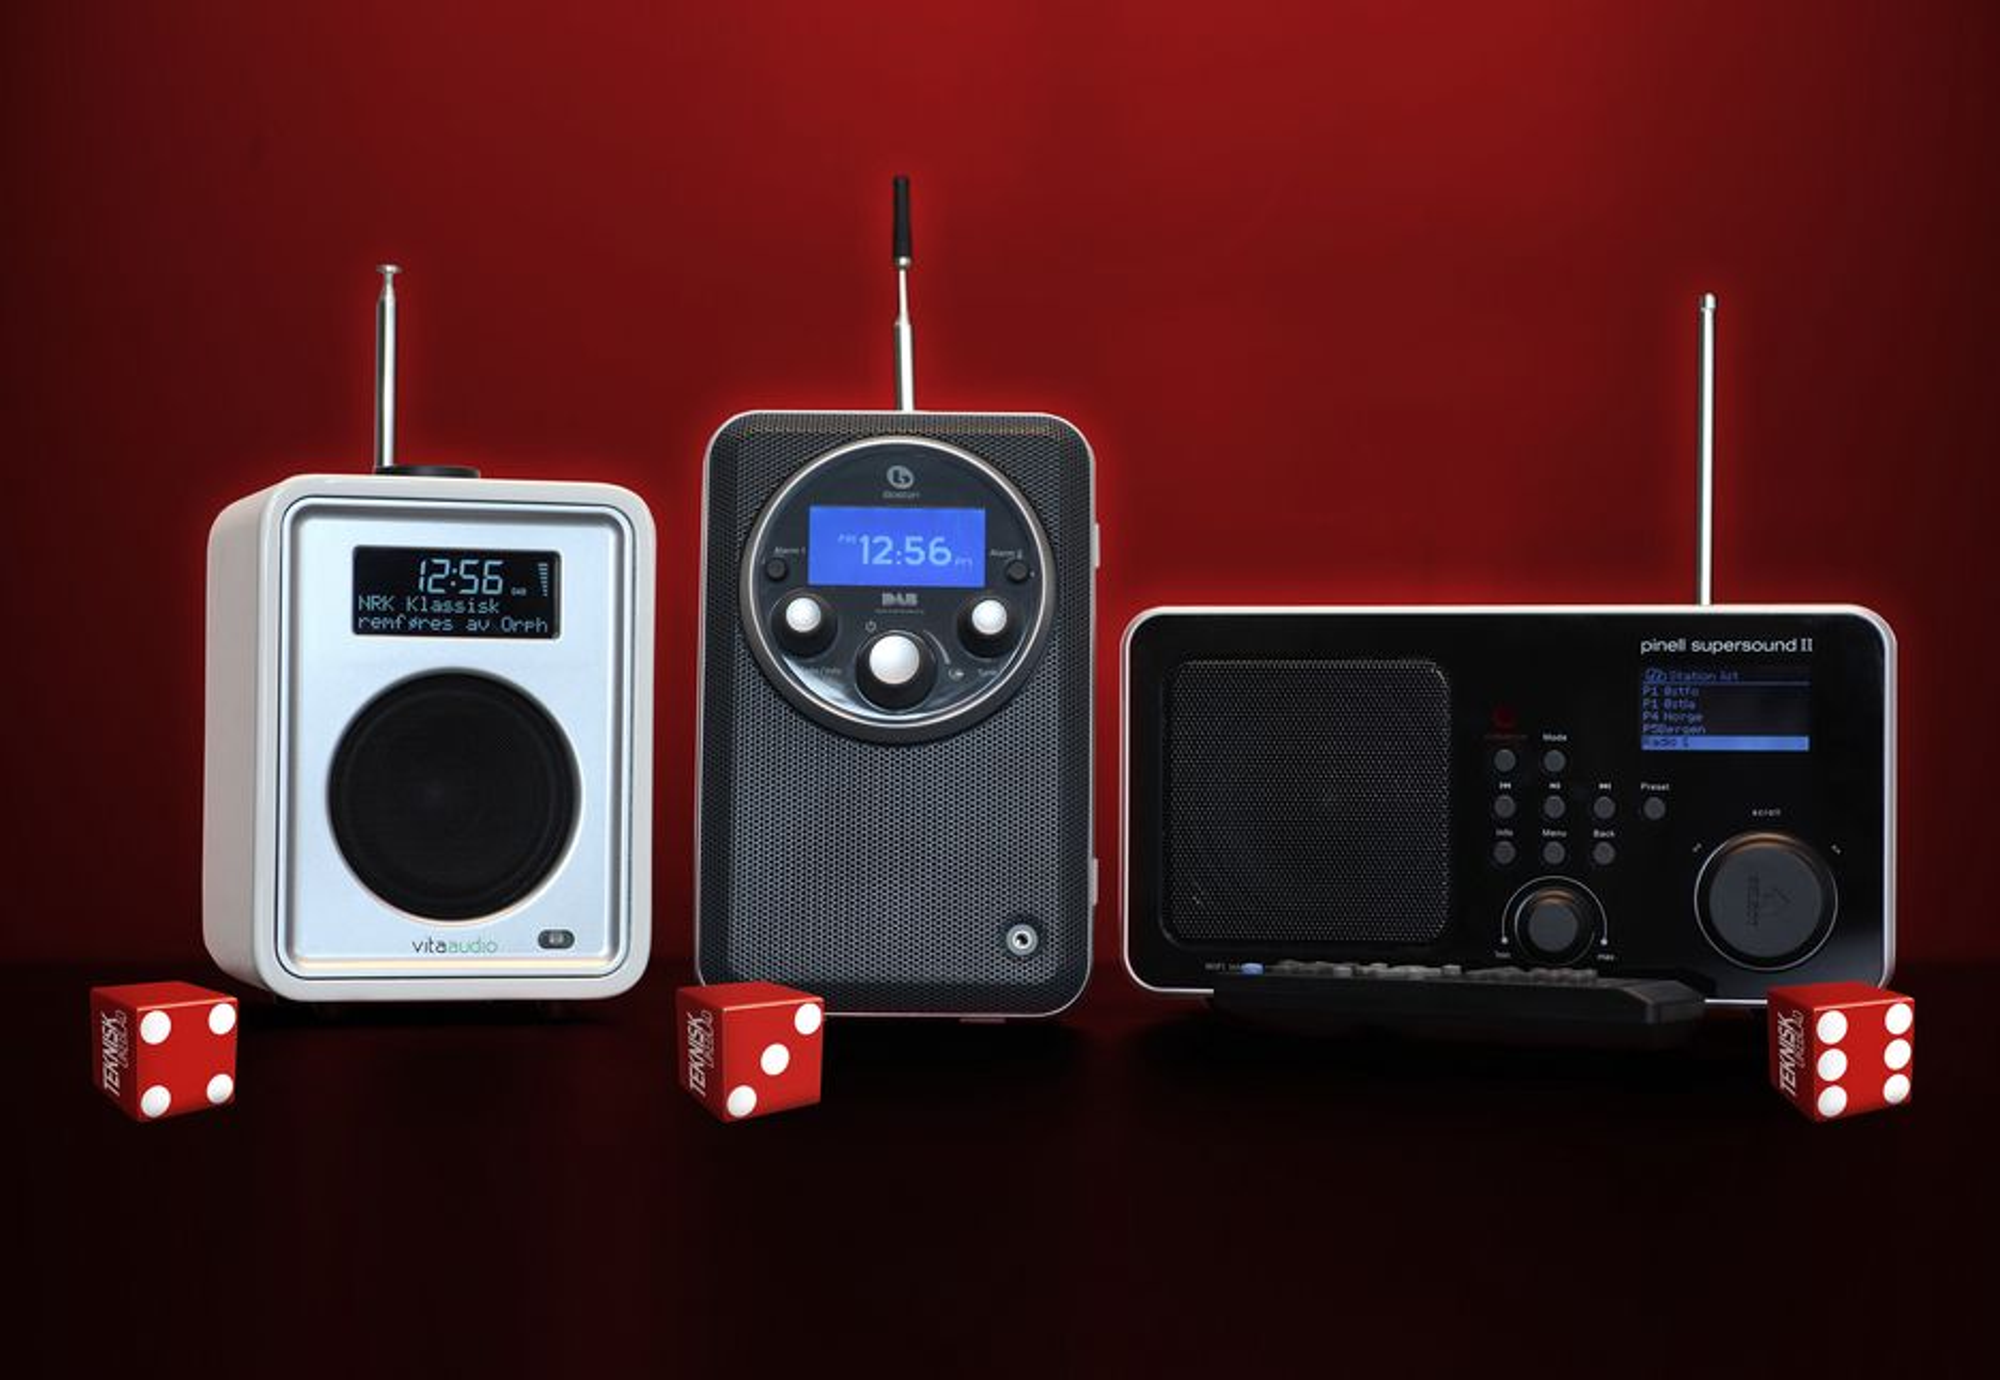 TERNINGKAST: Fra venstre: Vita Audio Model R1, Boston Horizon Solo XT, Pinell Supersound II